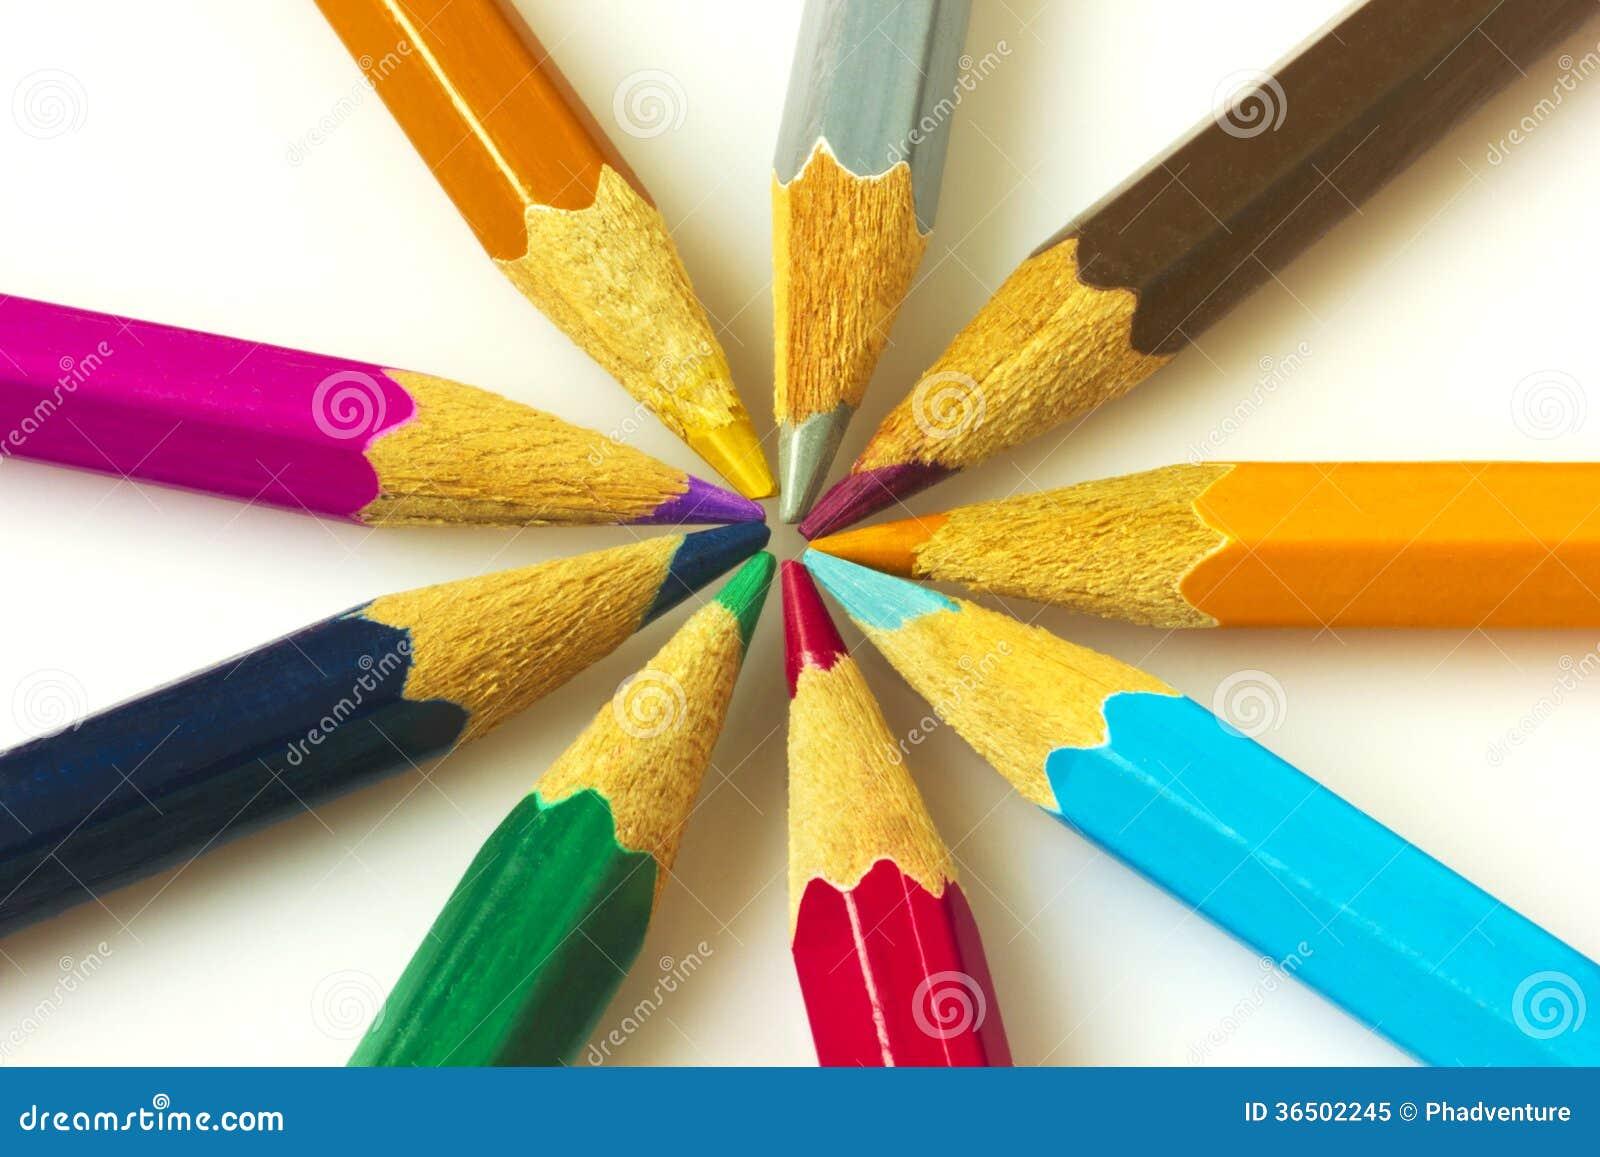 Красочные карандаши